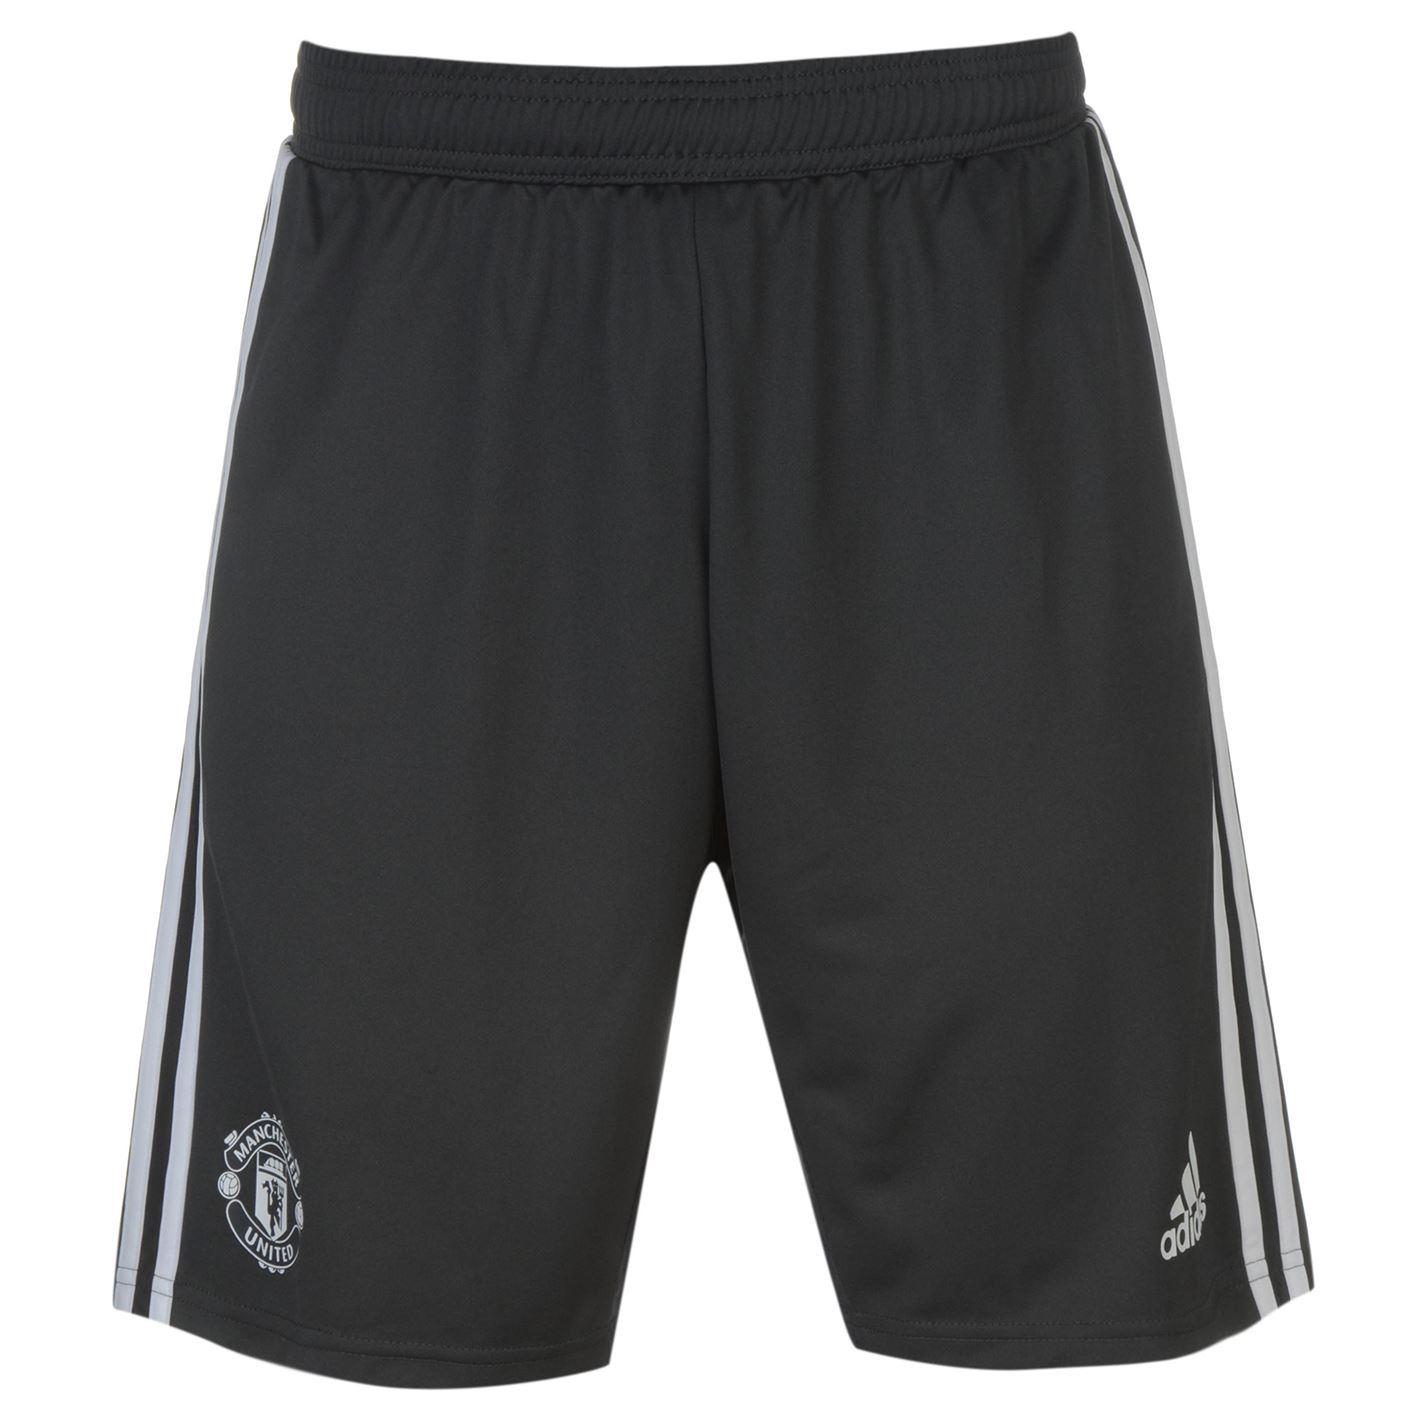 adidas Manchester United Training Shorts Mens Black White Football Soccer  Short 4f16cc4ea1c52